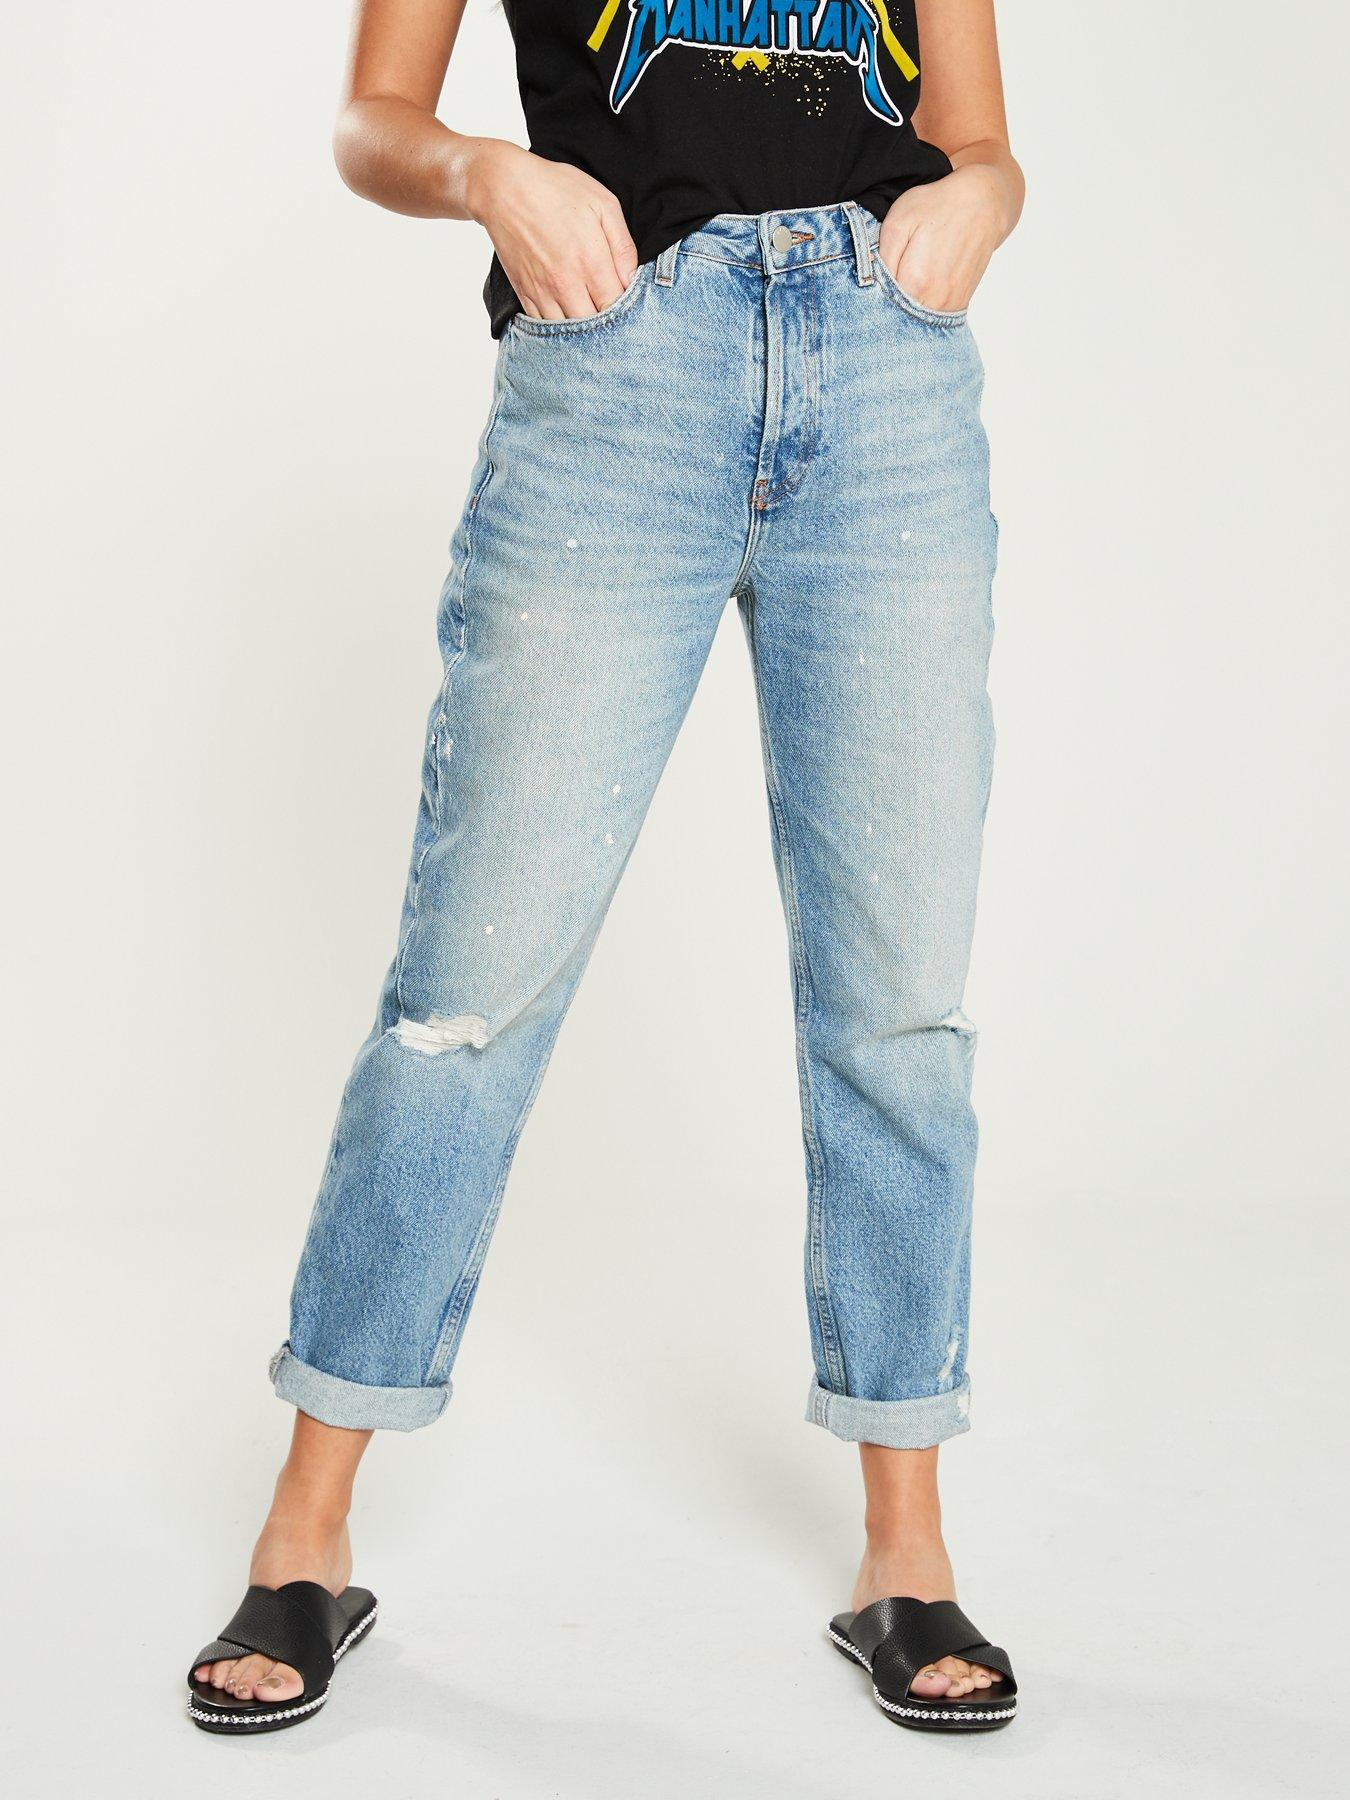 Intelligent New Next Jeans Size 12-18 Months Baby